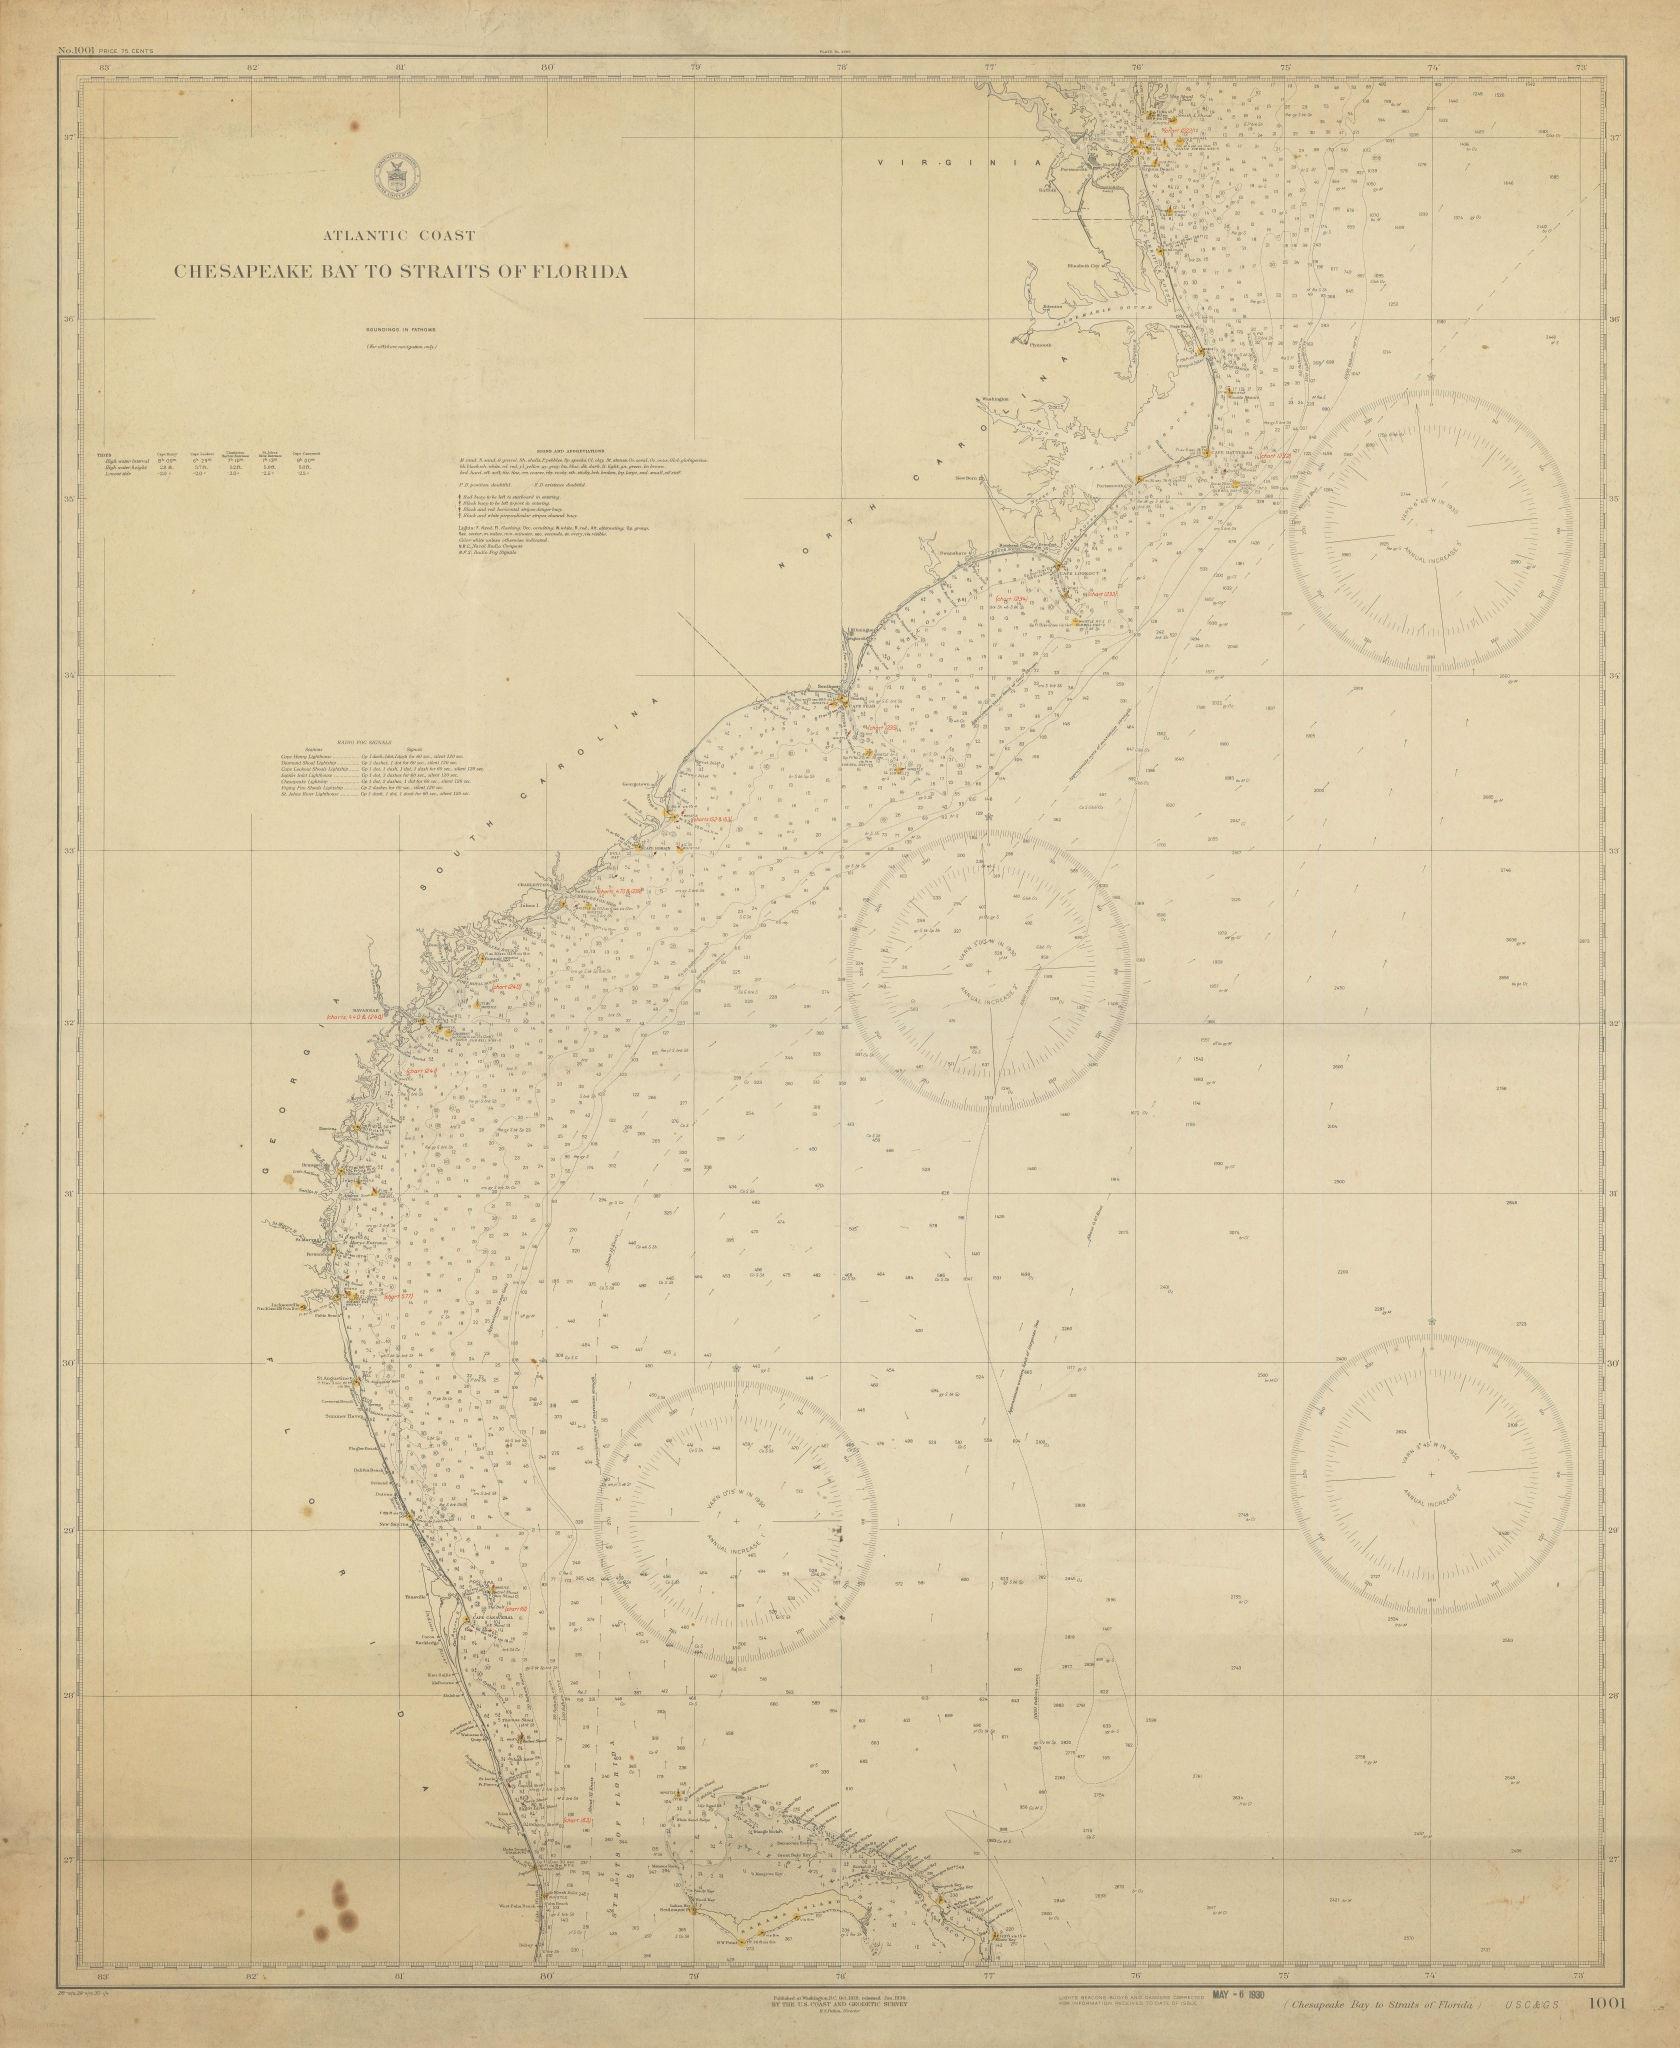 USA Atlantic Coast Chesapeake Bay-Florida Strait USCGS sea chart 1928 (1930) map